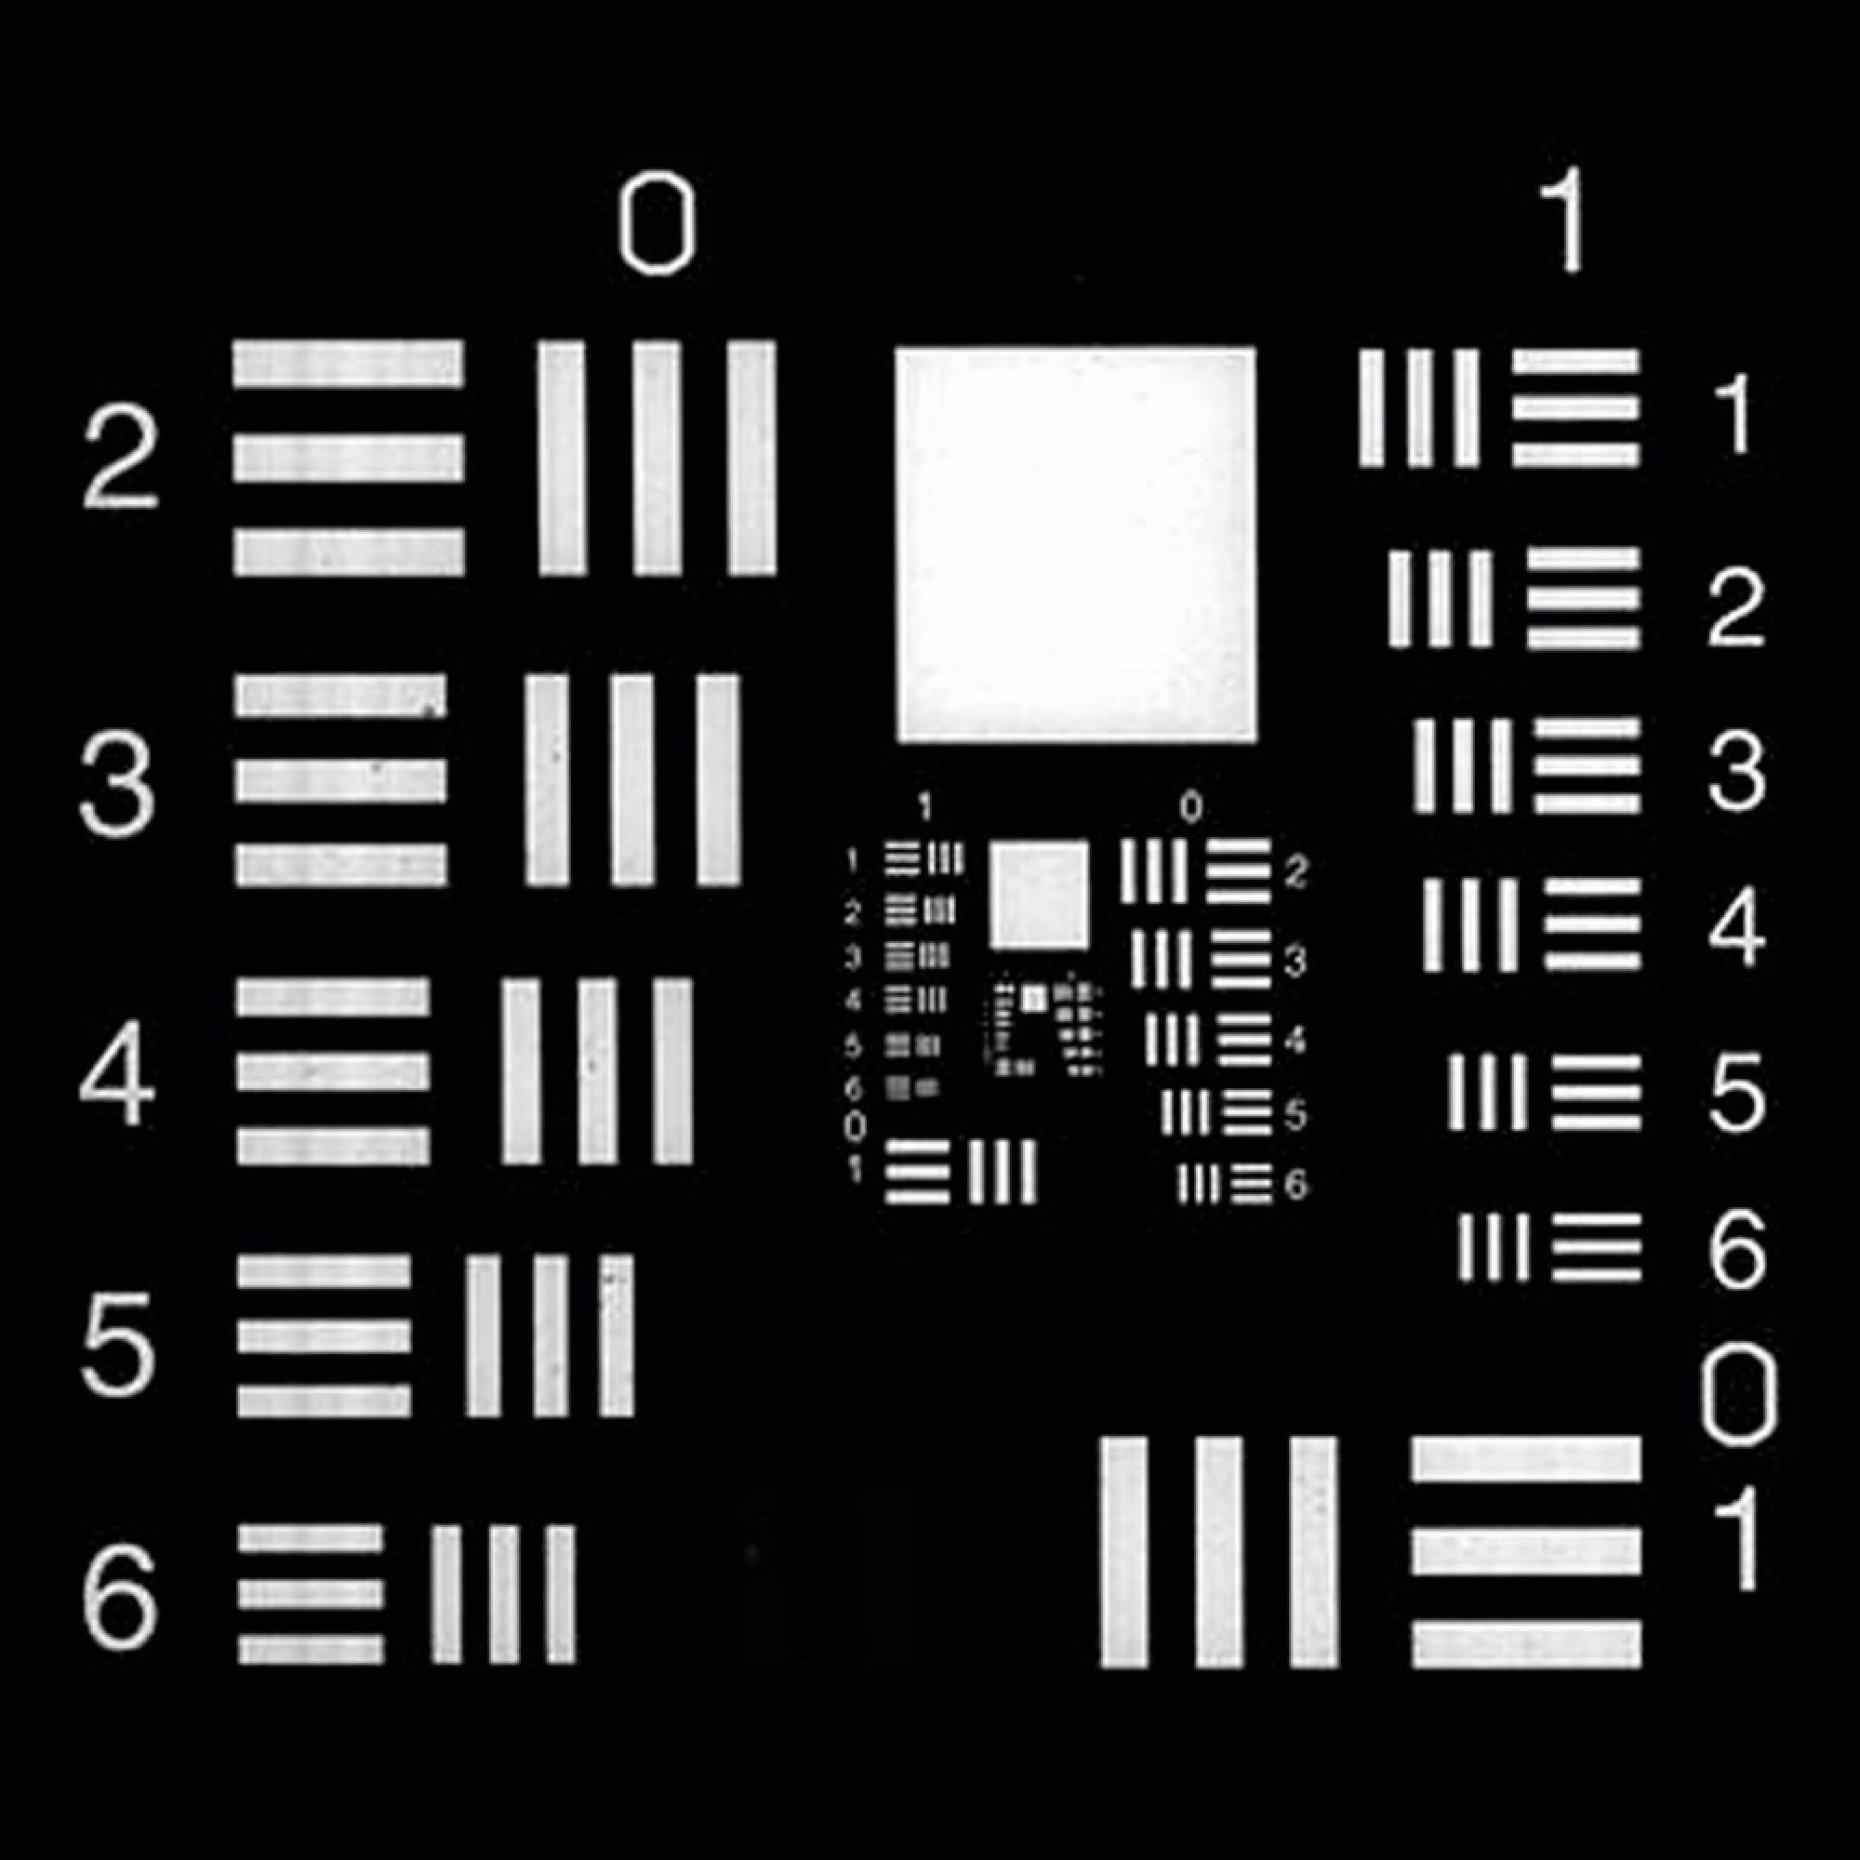 R75N USAF Negative Test Chart Group 0/9 Element 1/3